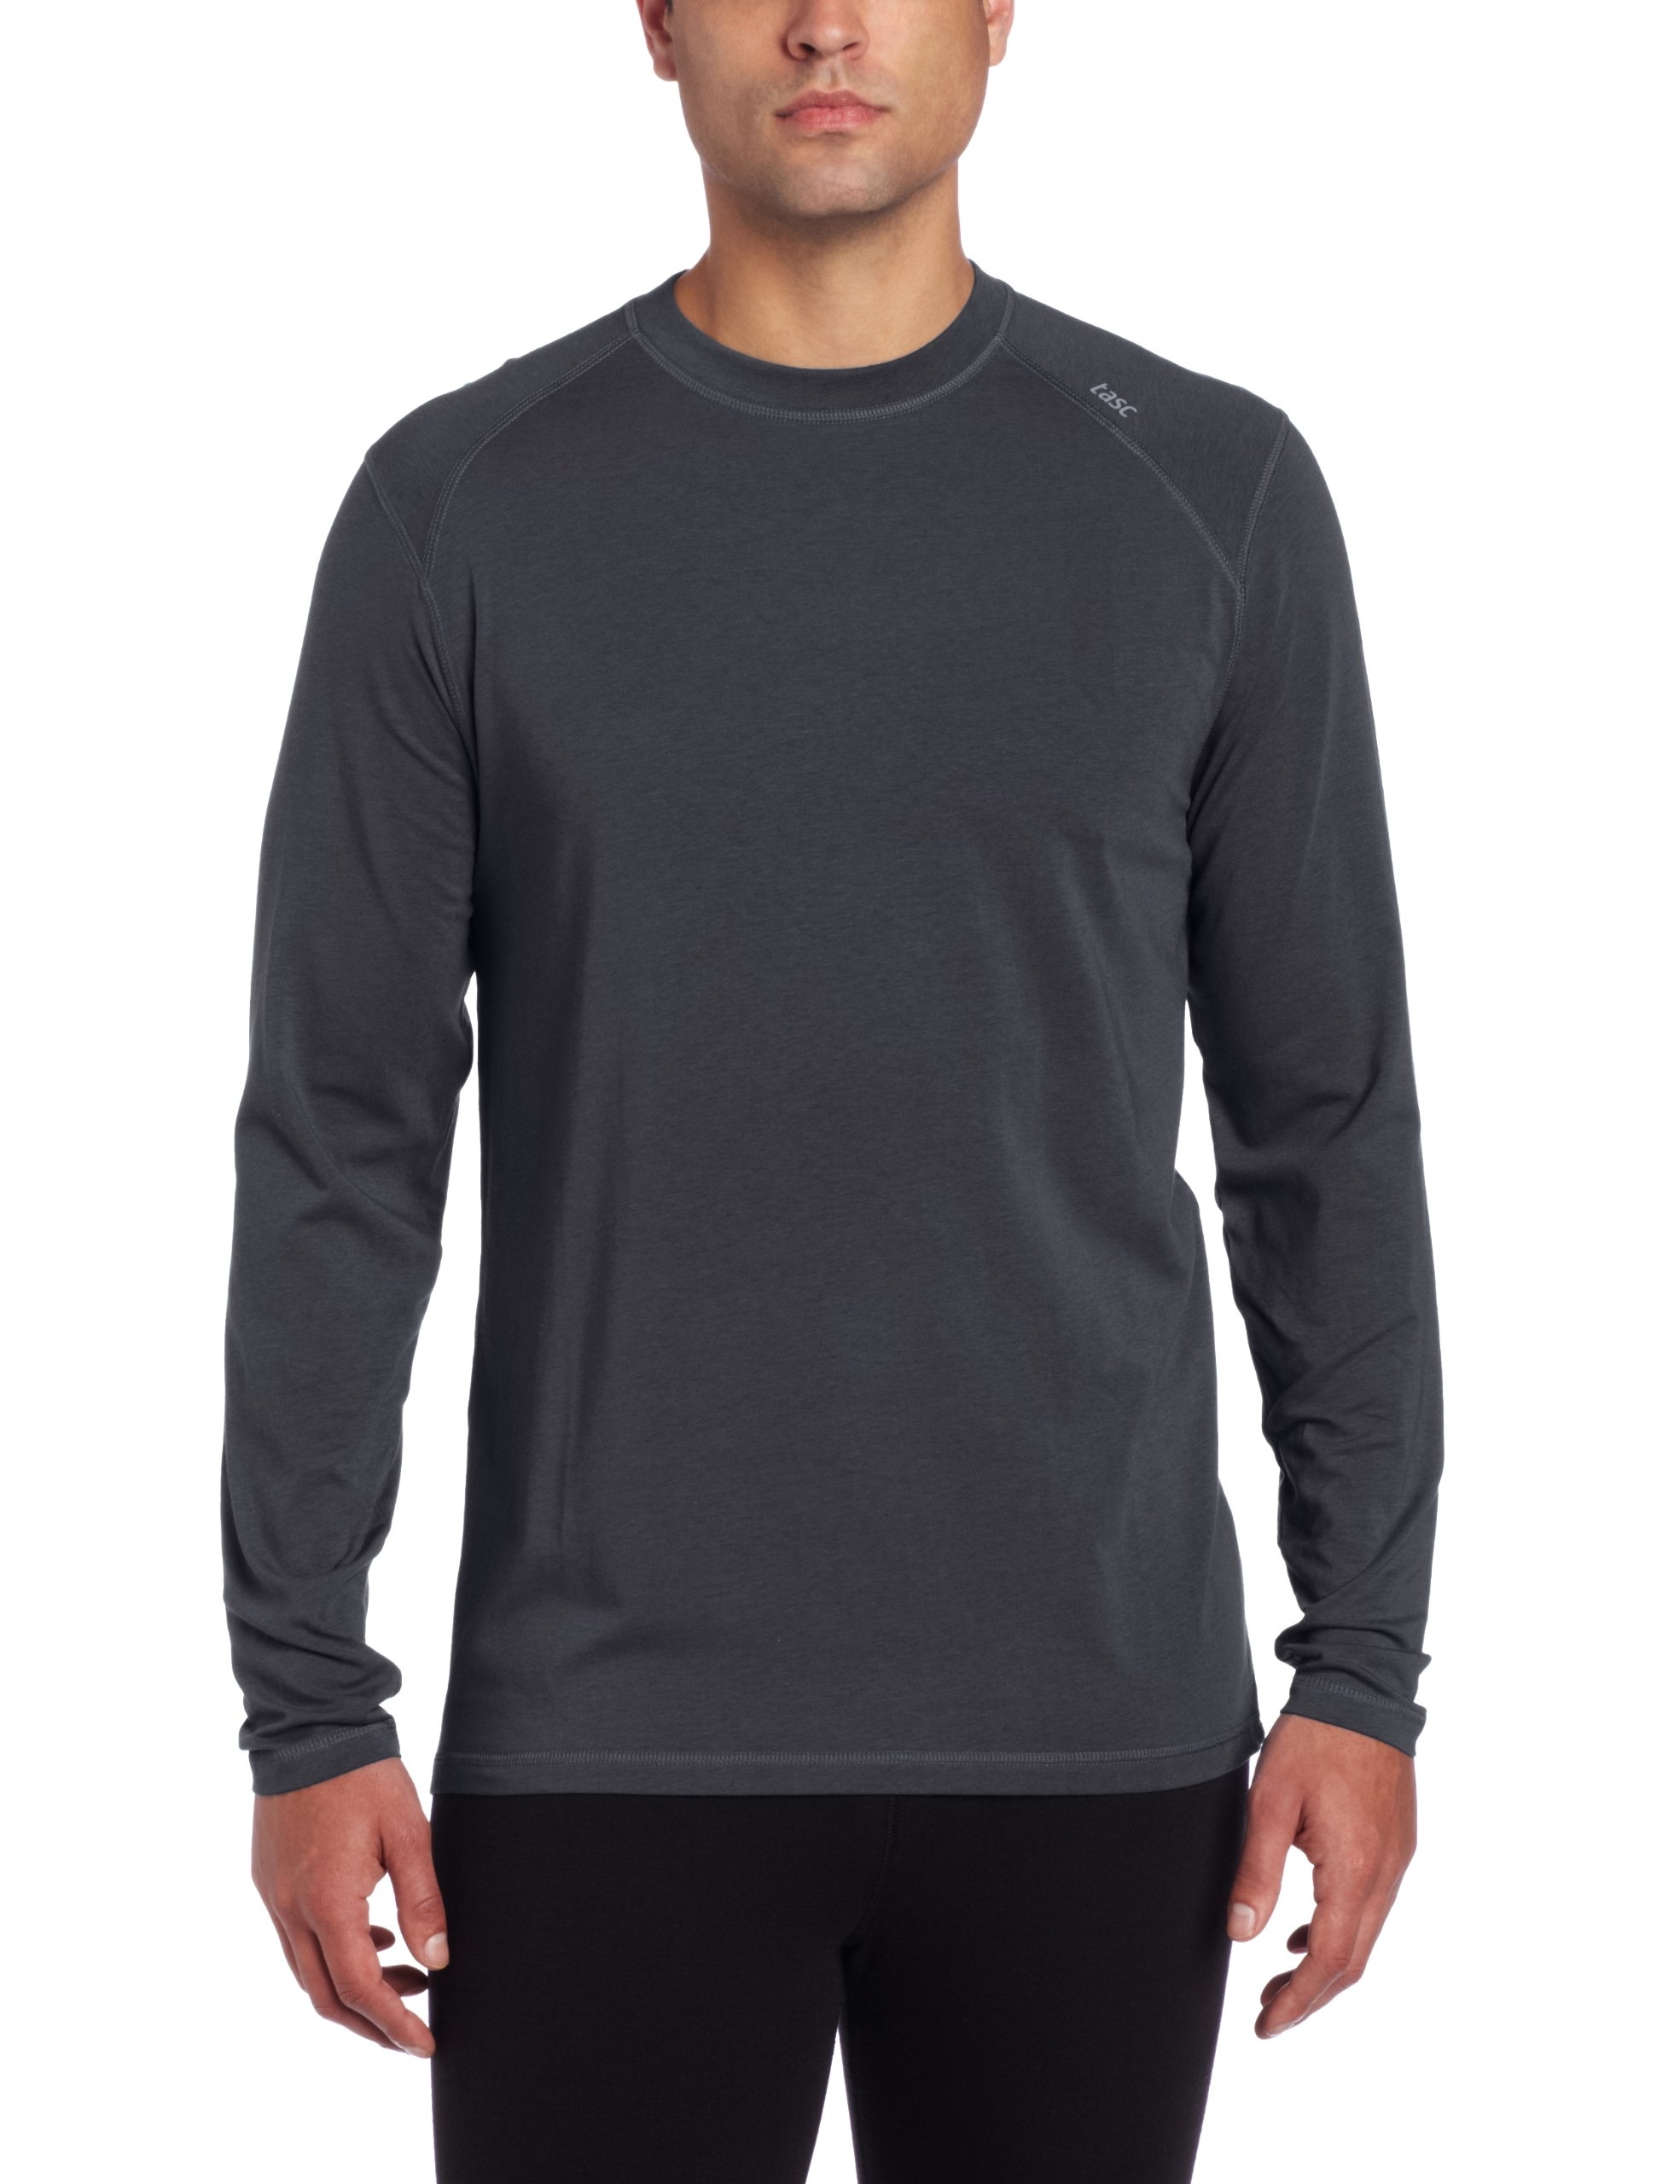 tasc Performance Carrollton Long Sleeve T-Shirt, Gunmetal, Large by tasc Performance